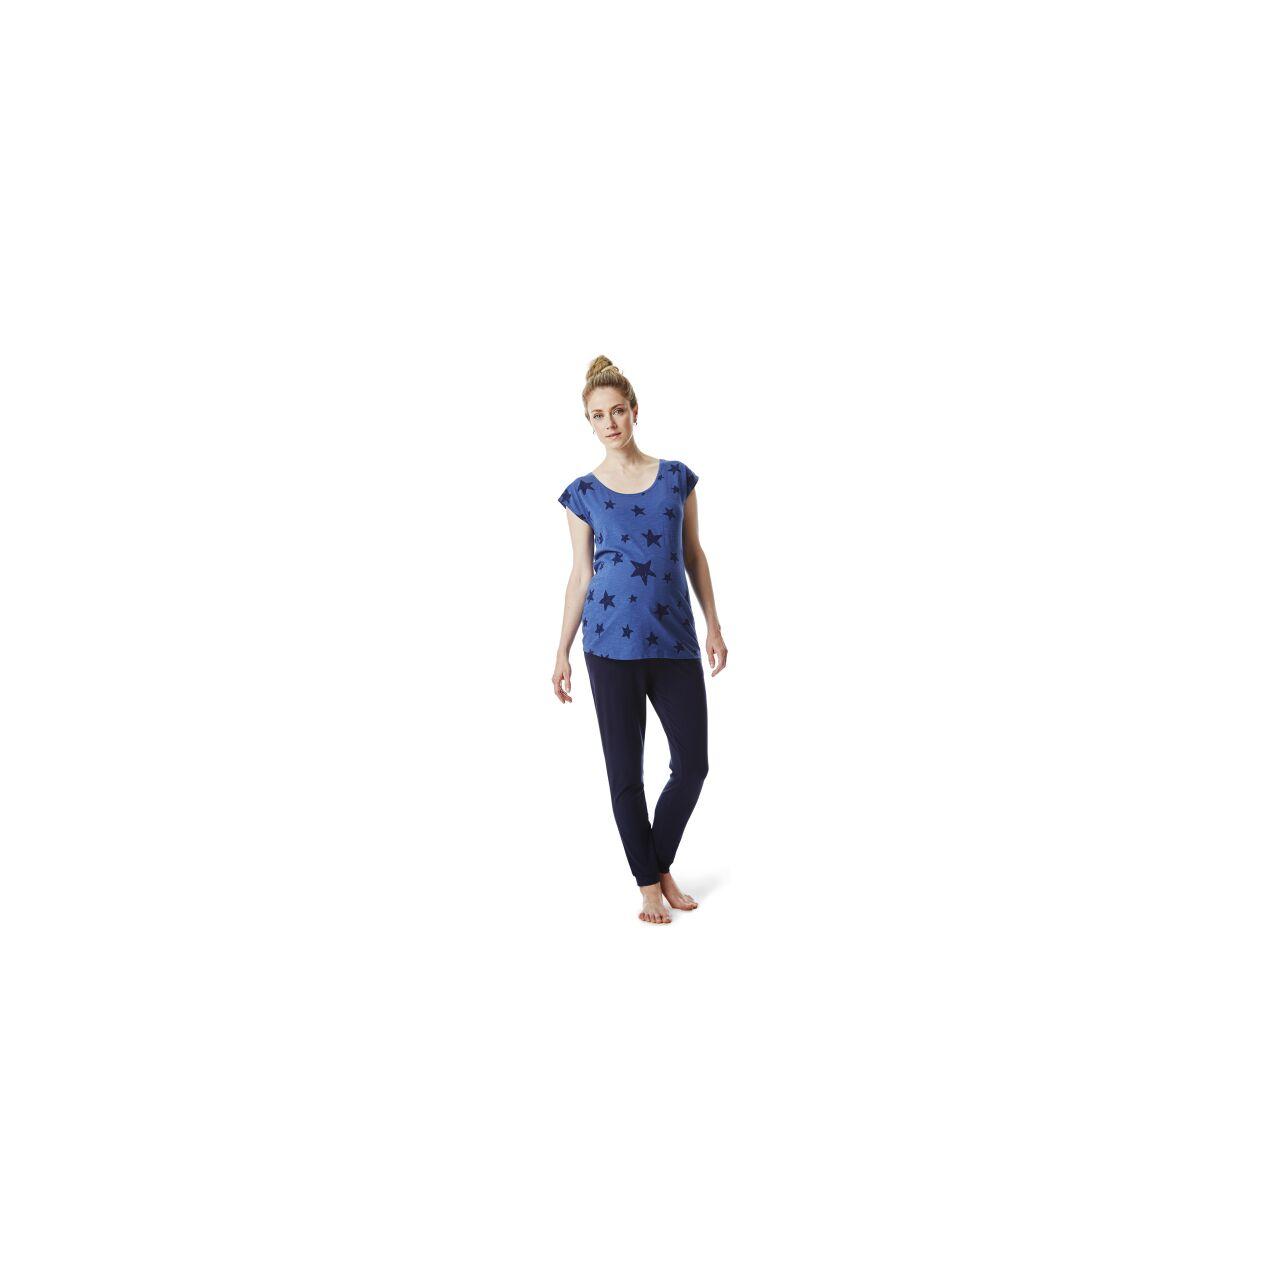 esprit maternity t shirt lang azure blue xl 29 99. Black Bedroom Furniture Sets. Home Design Ideas